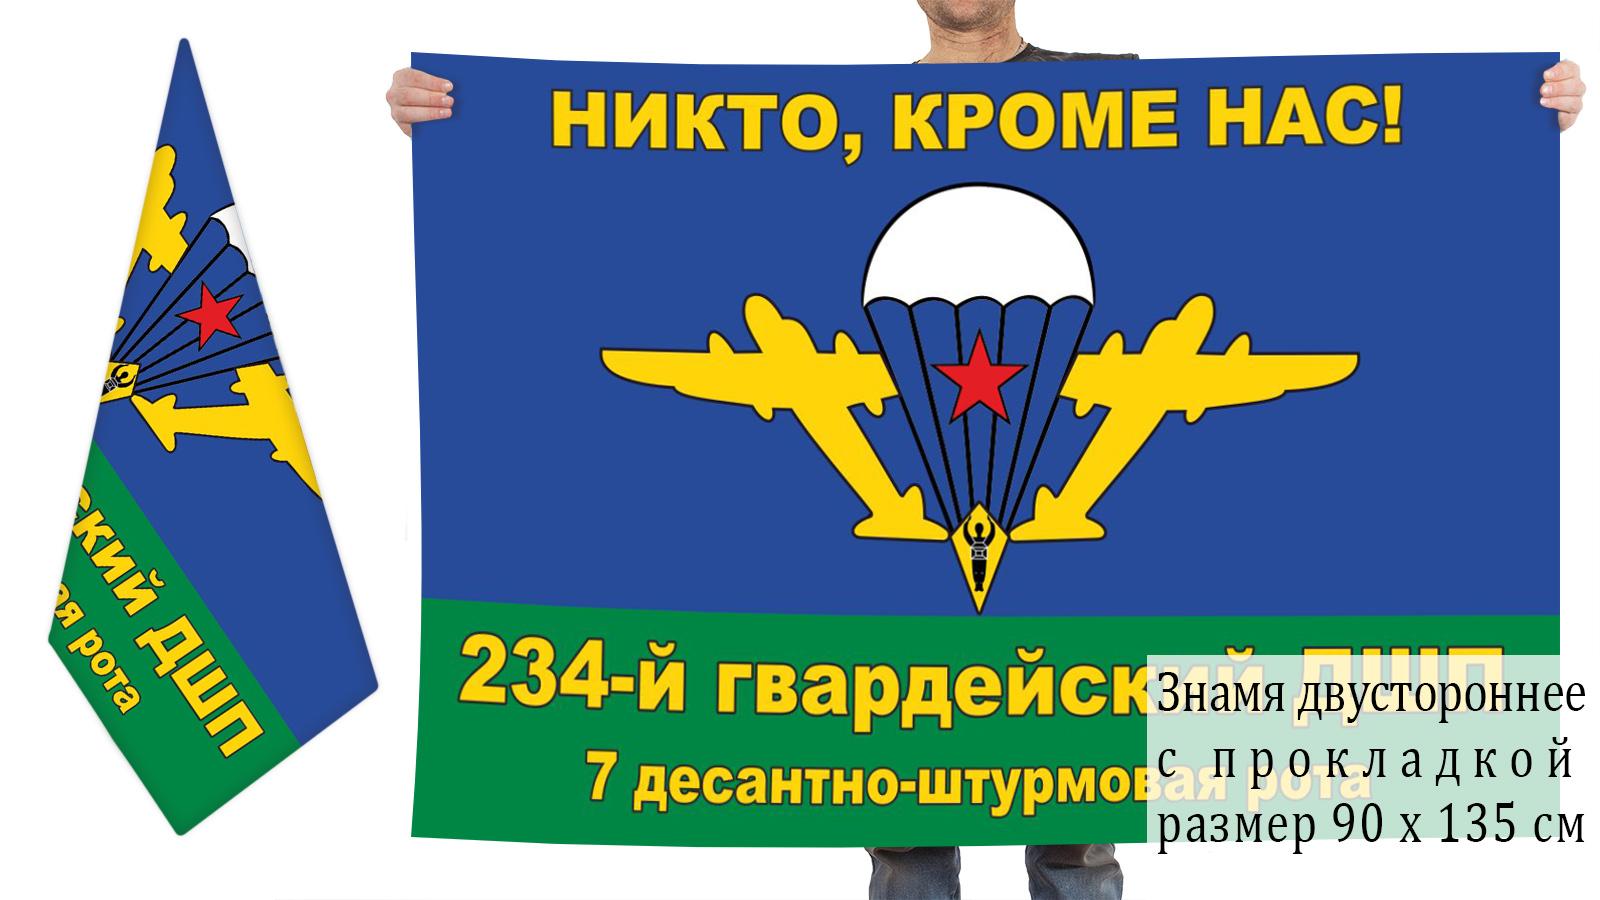 Двусторонний флаг 7 десантно-штурмовой роты 234 гвардейского ДШП